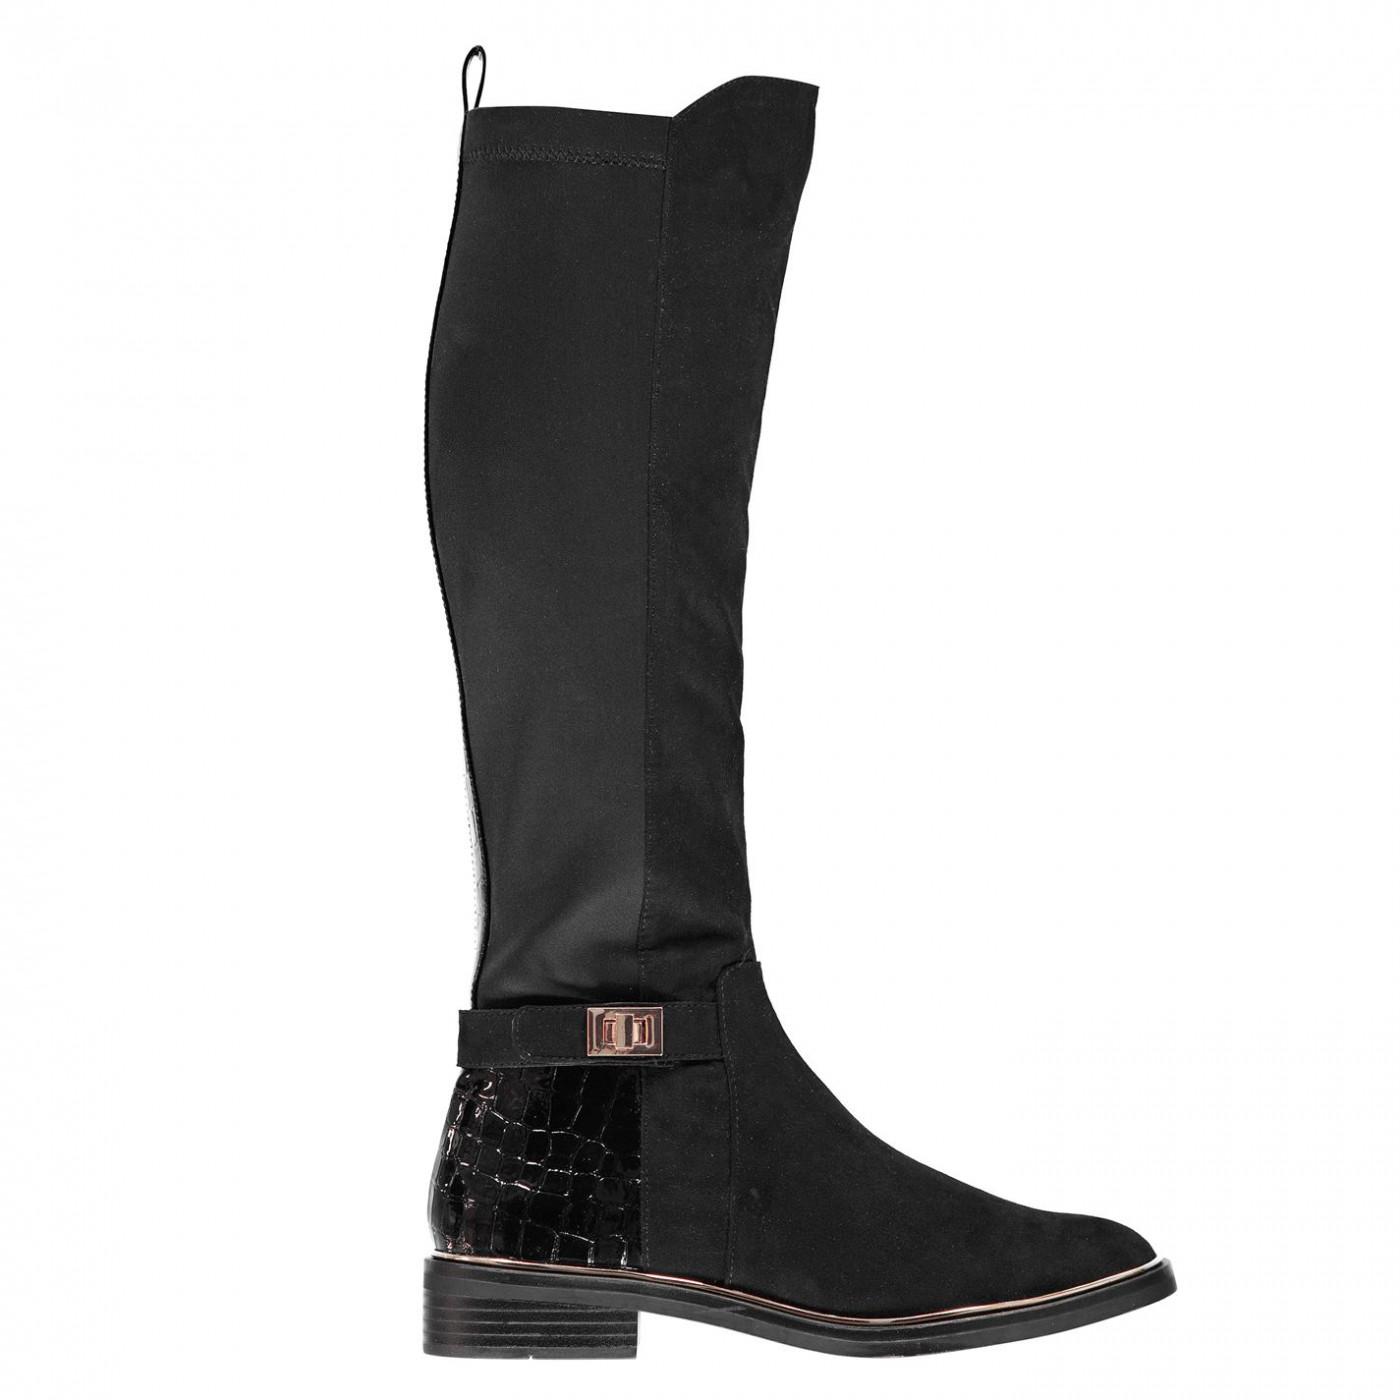 Miso Capri Knee High Ladies Boots